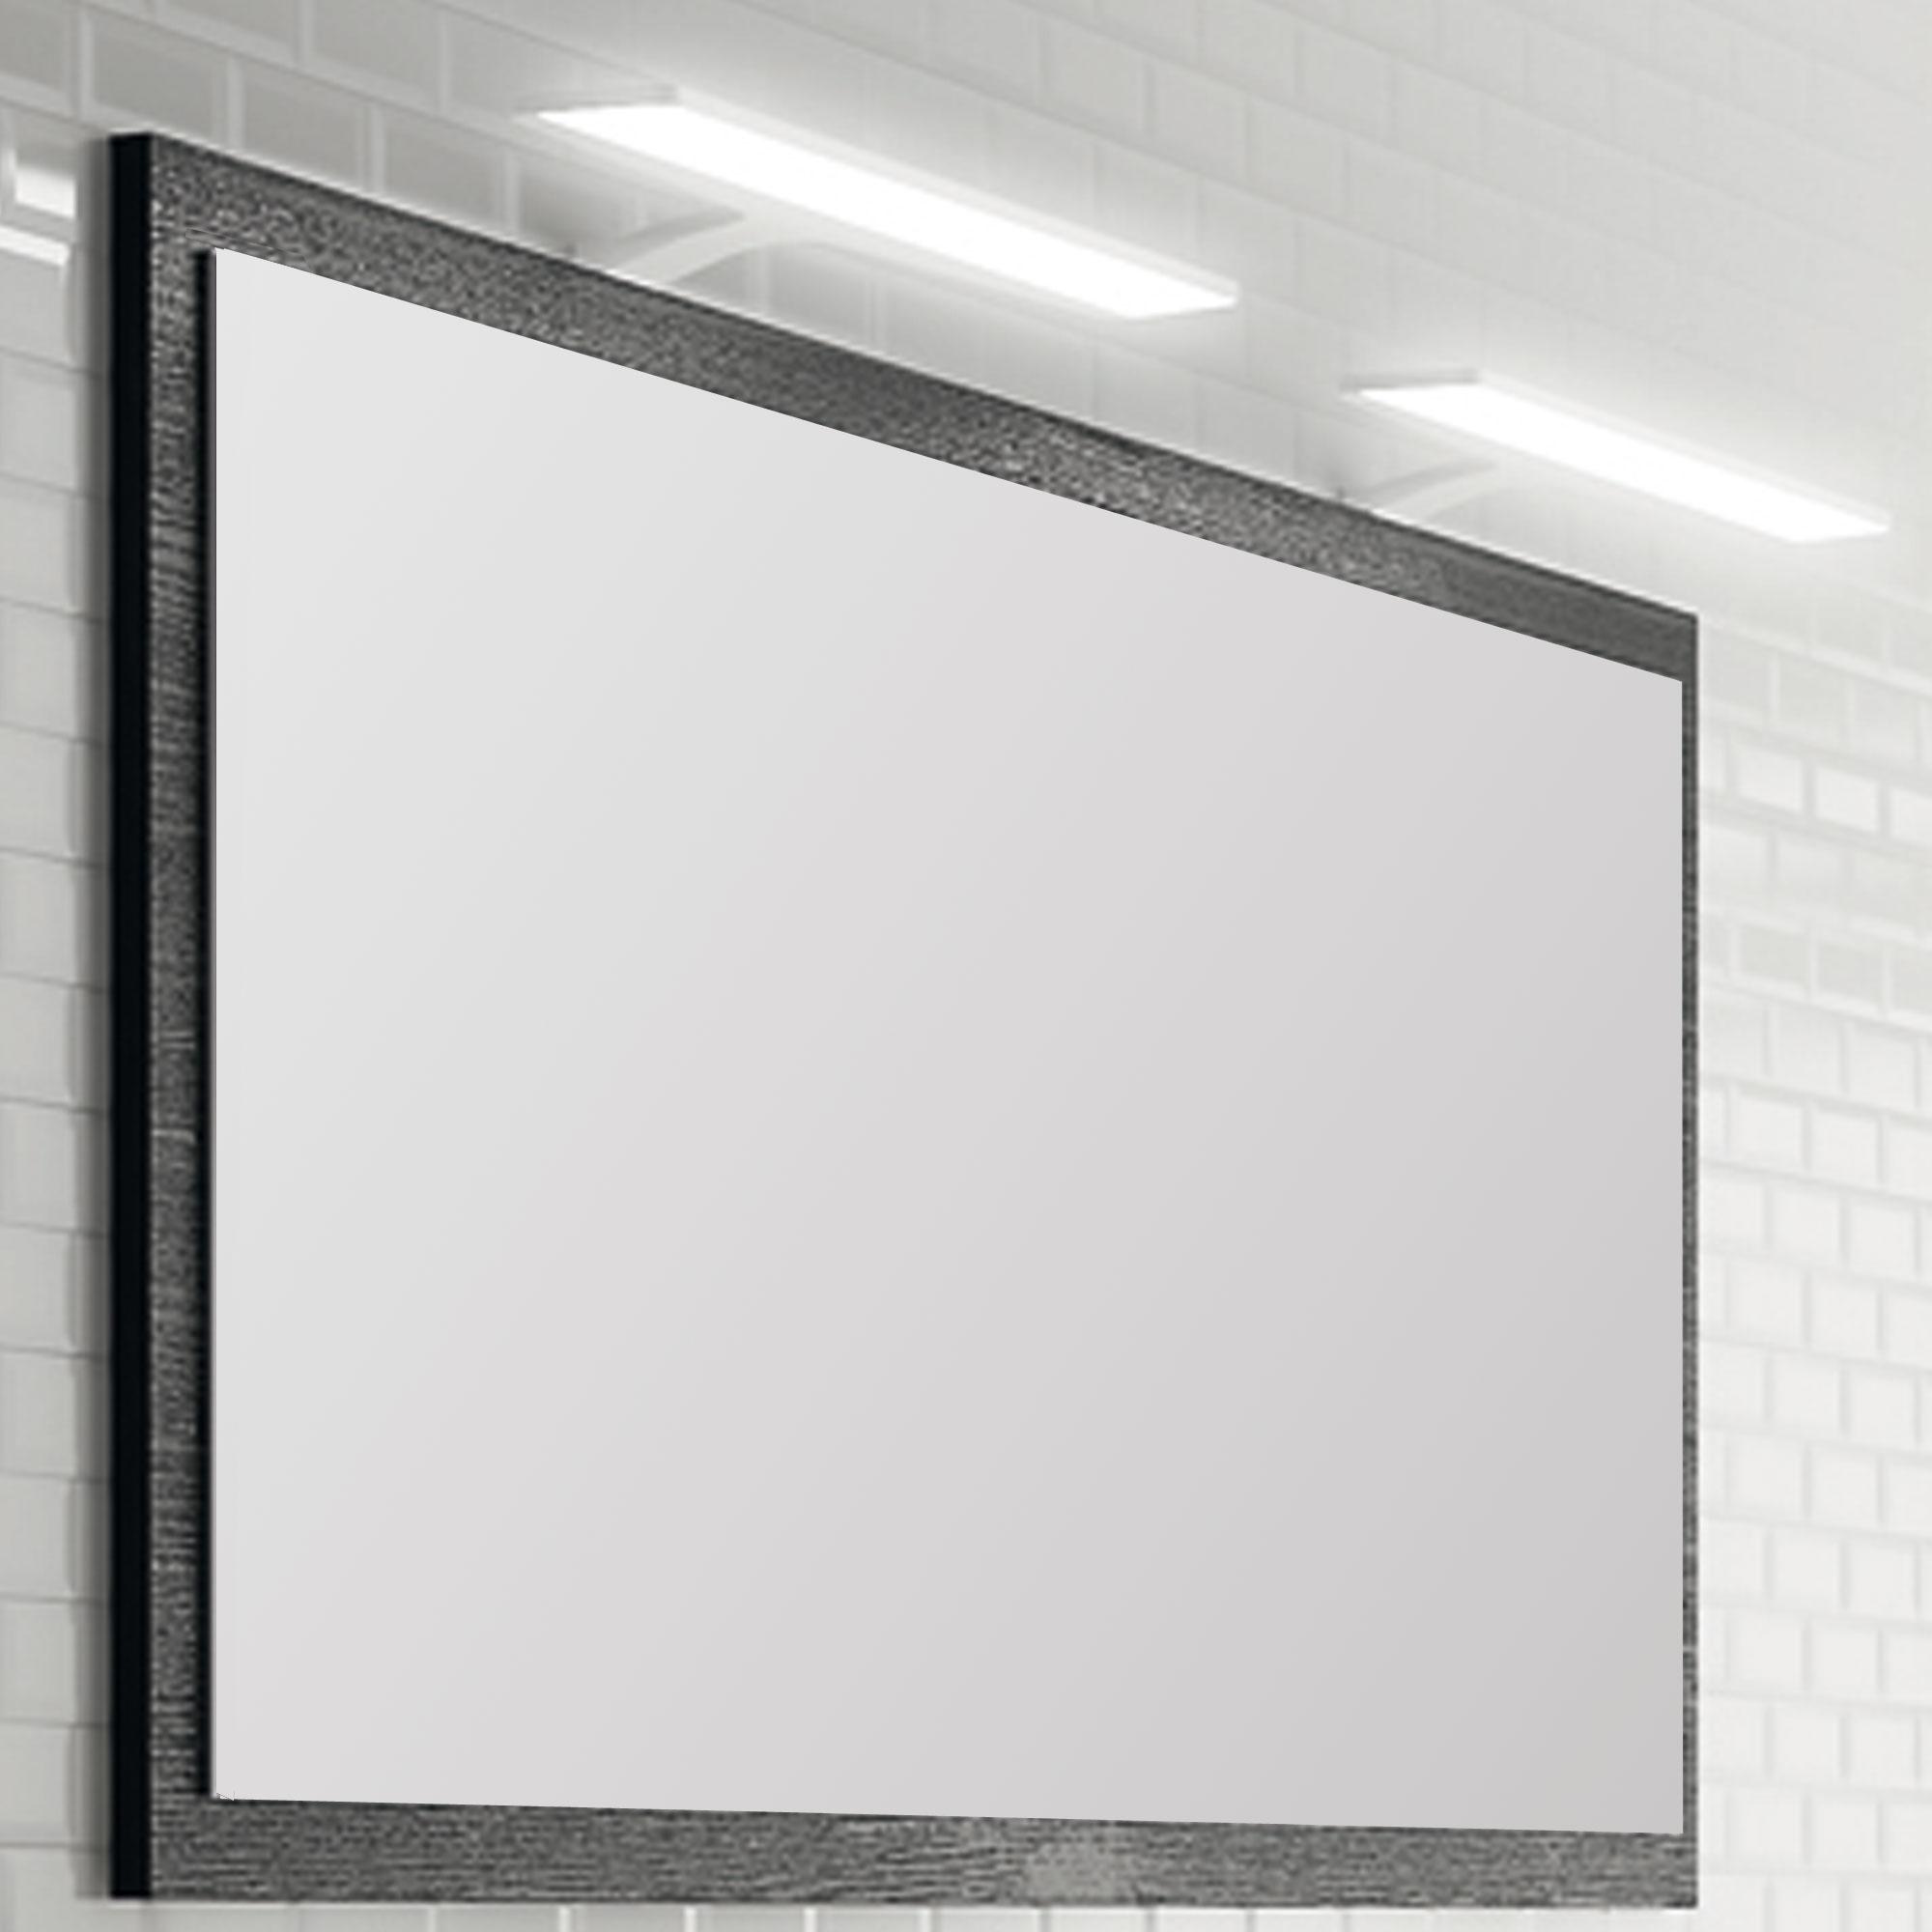 Miroir cadre bois feeling meubles de salle de bains for Miroir 140 cm